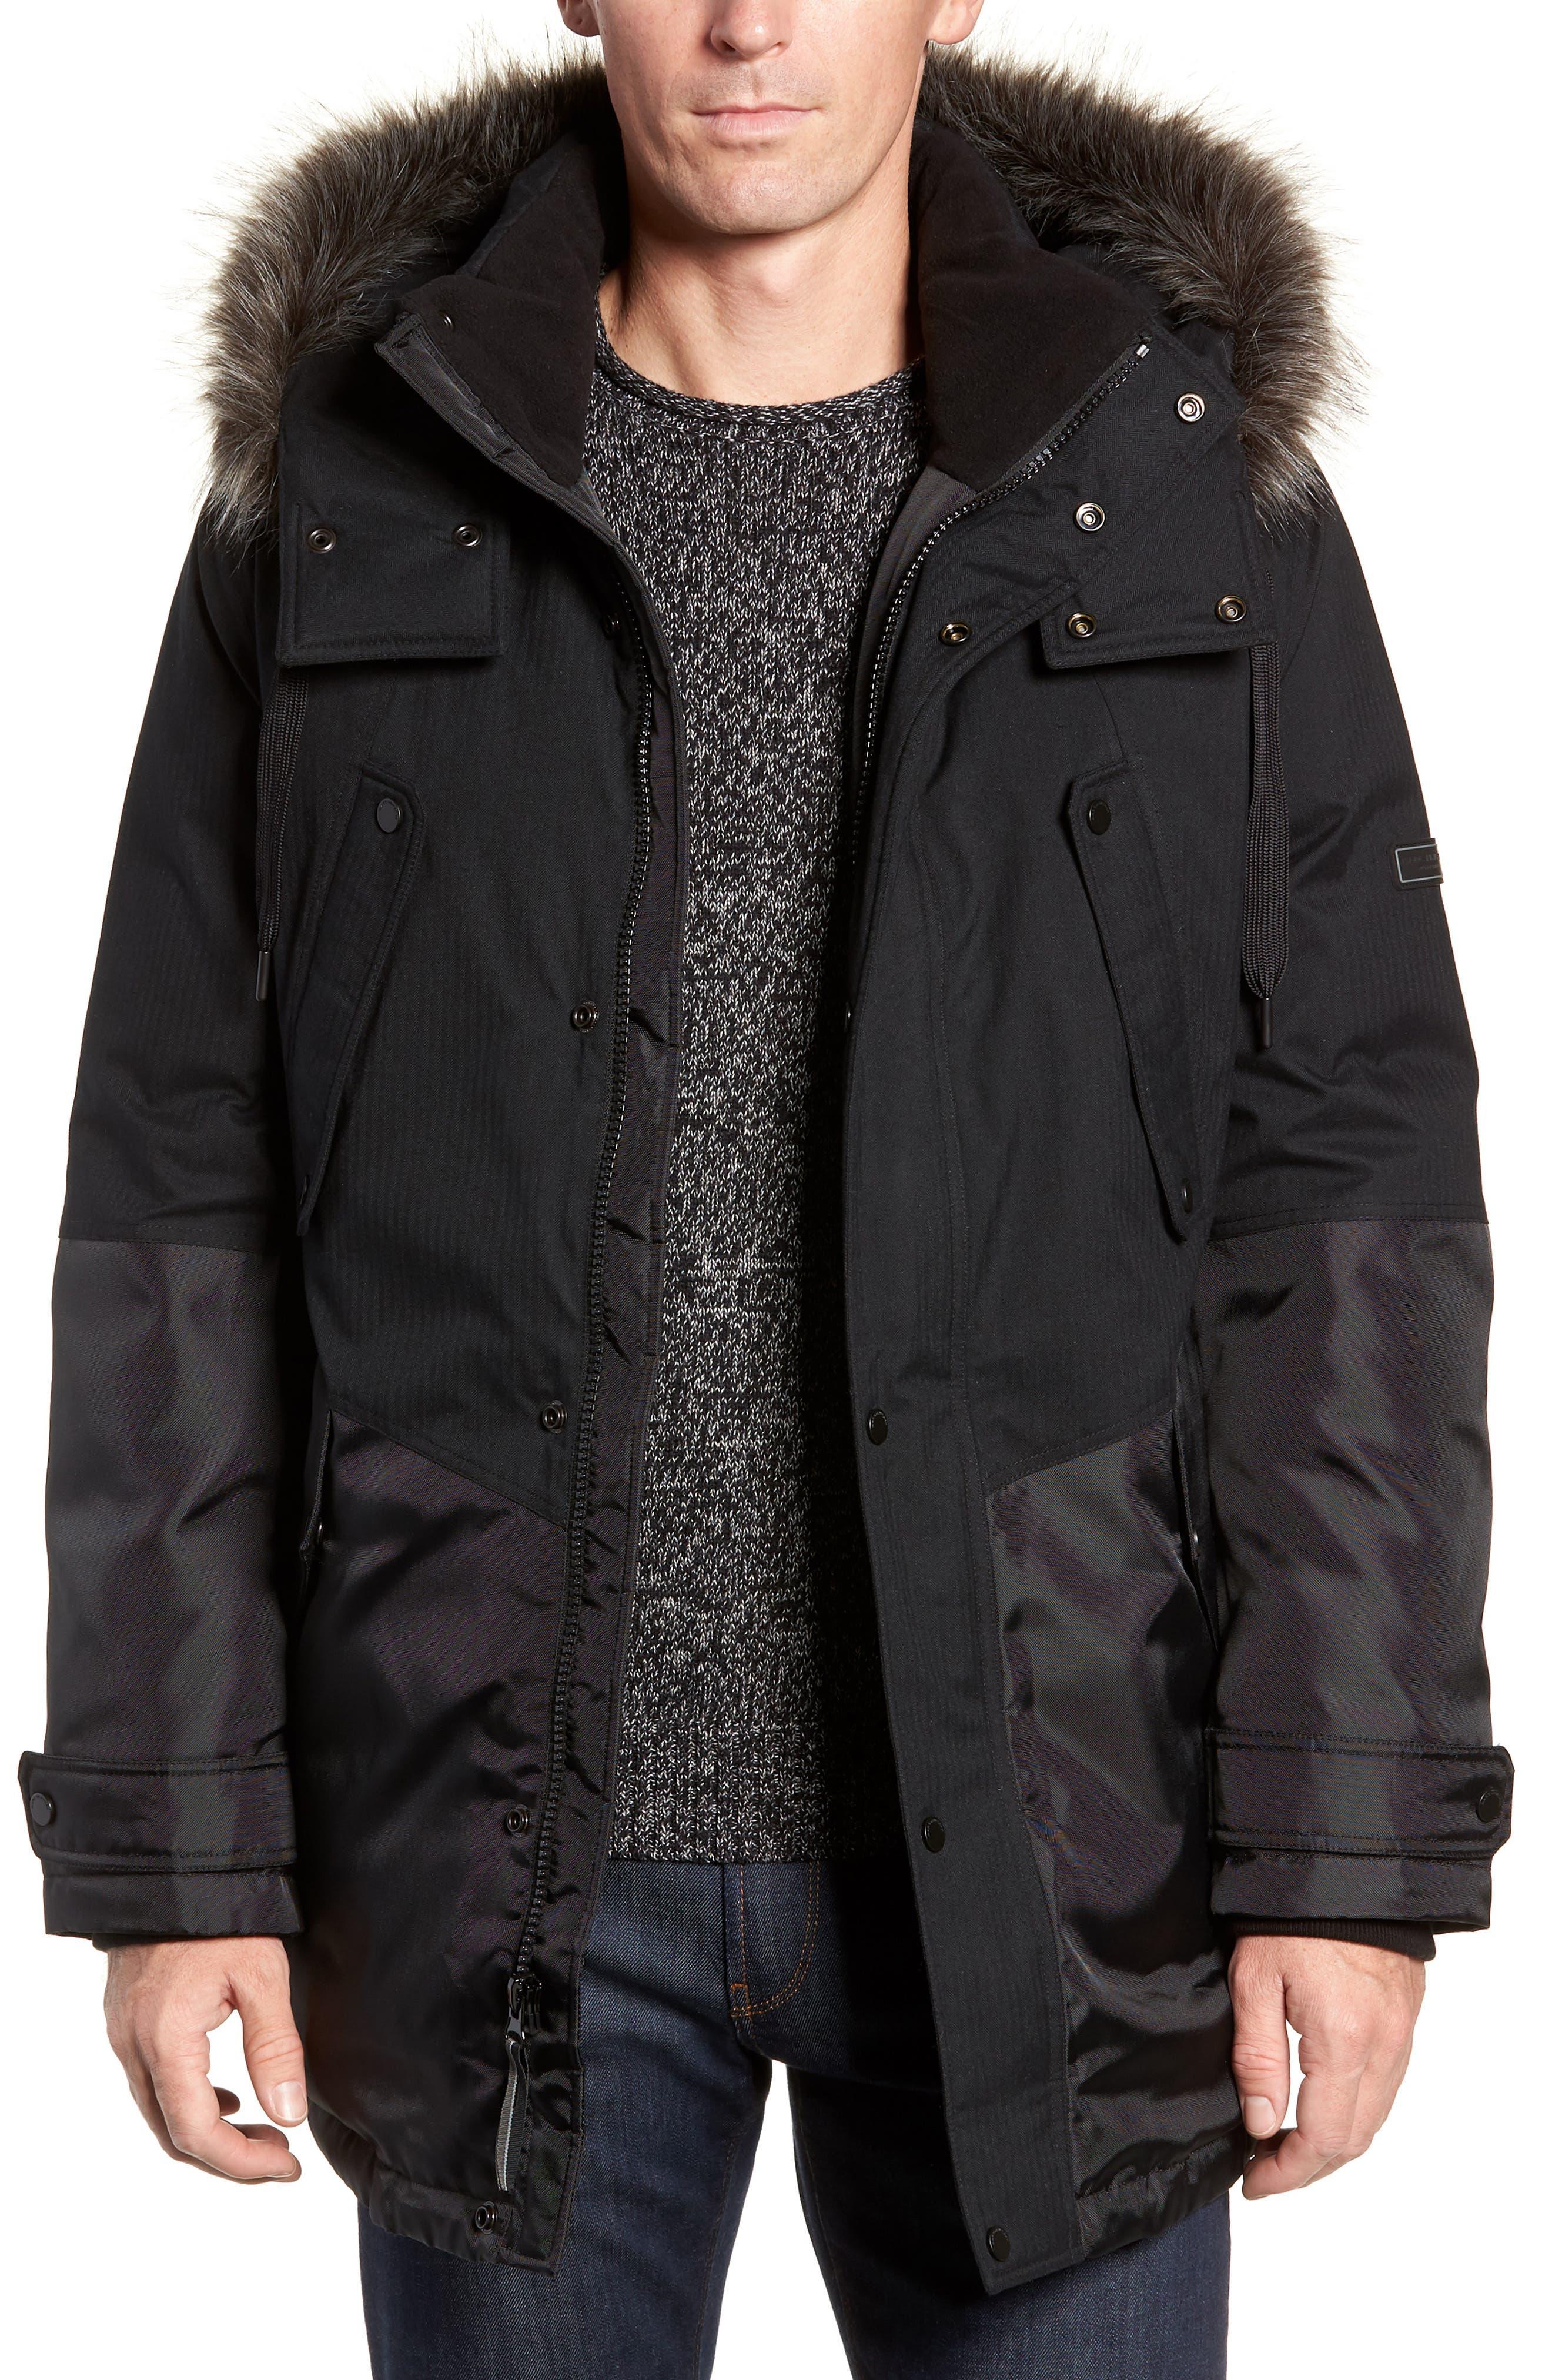 MARC NEW YORK, Maxfield Faux Fur Trim Parka, Main thumbnail 1, color, BLACK